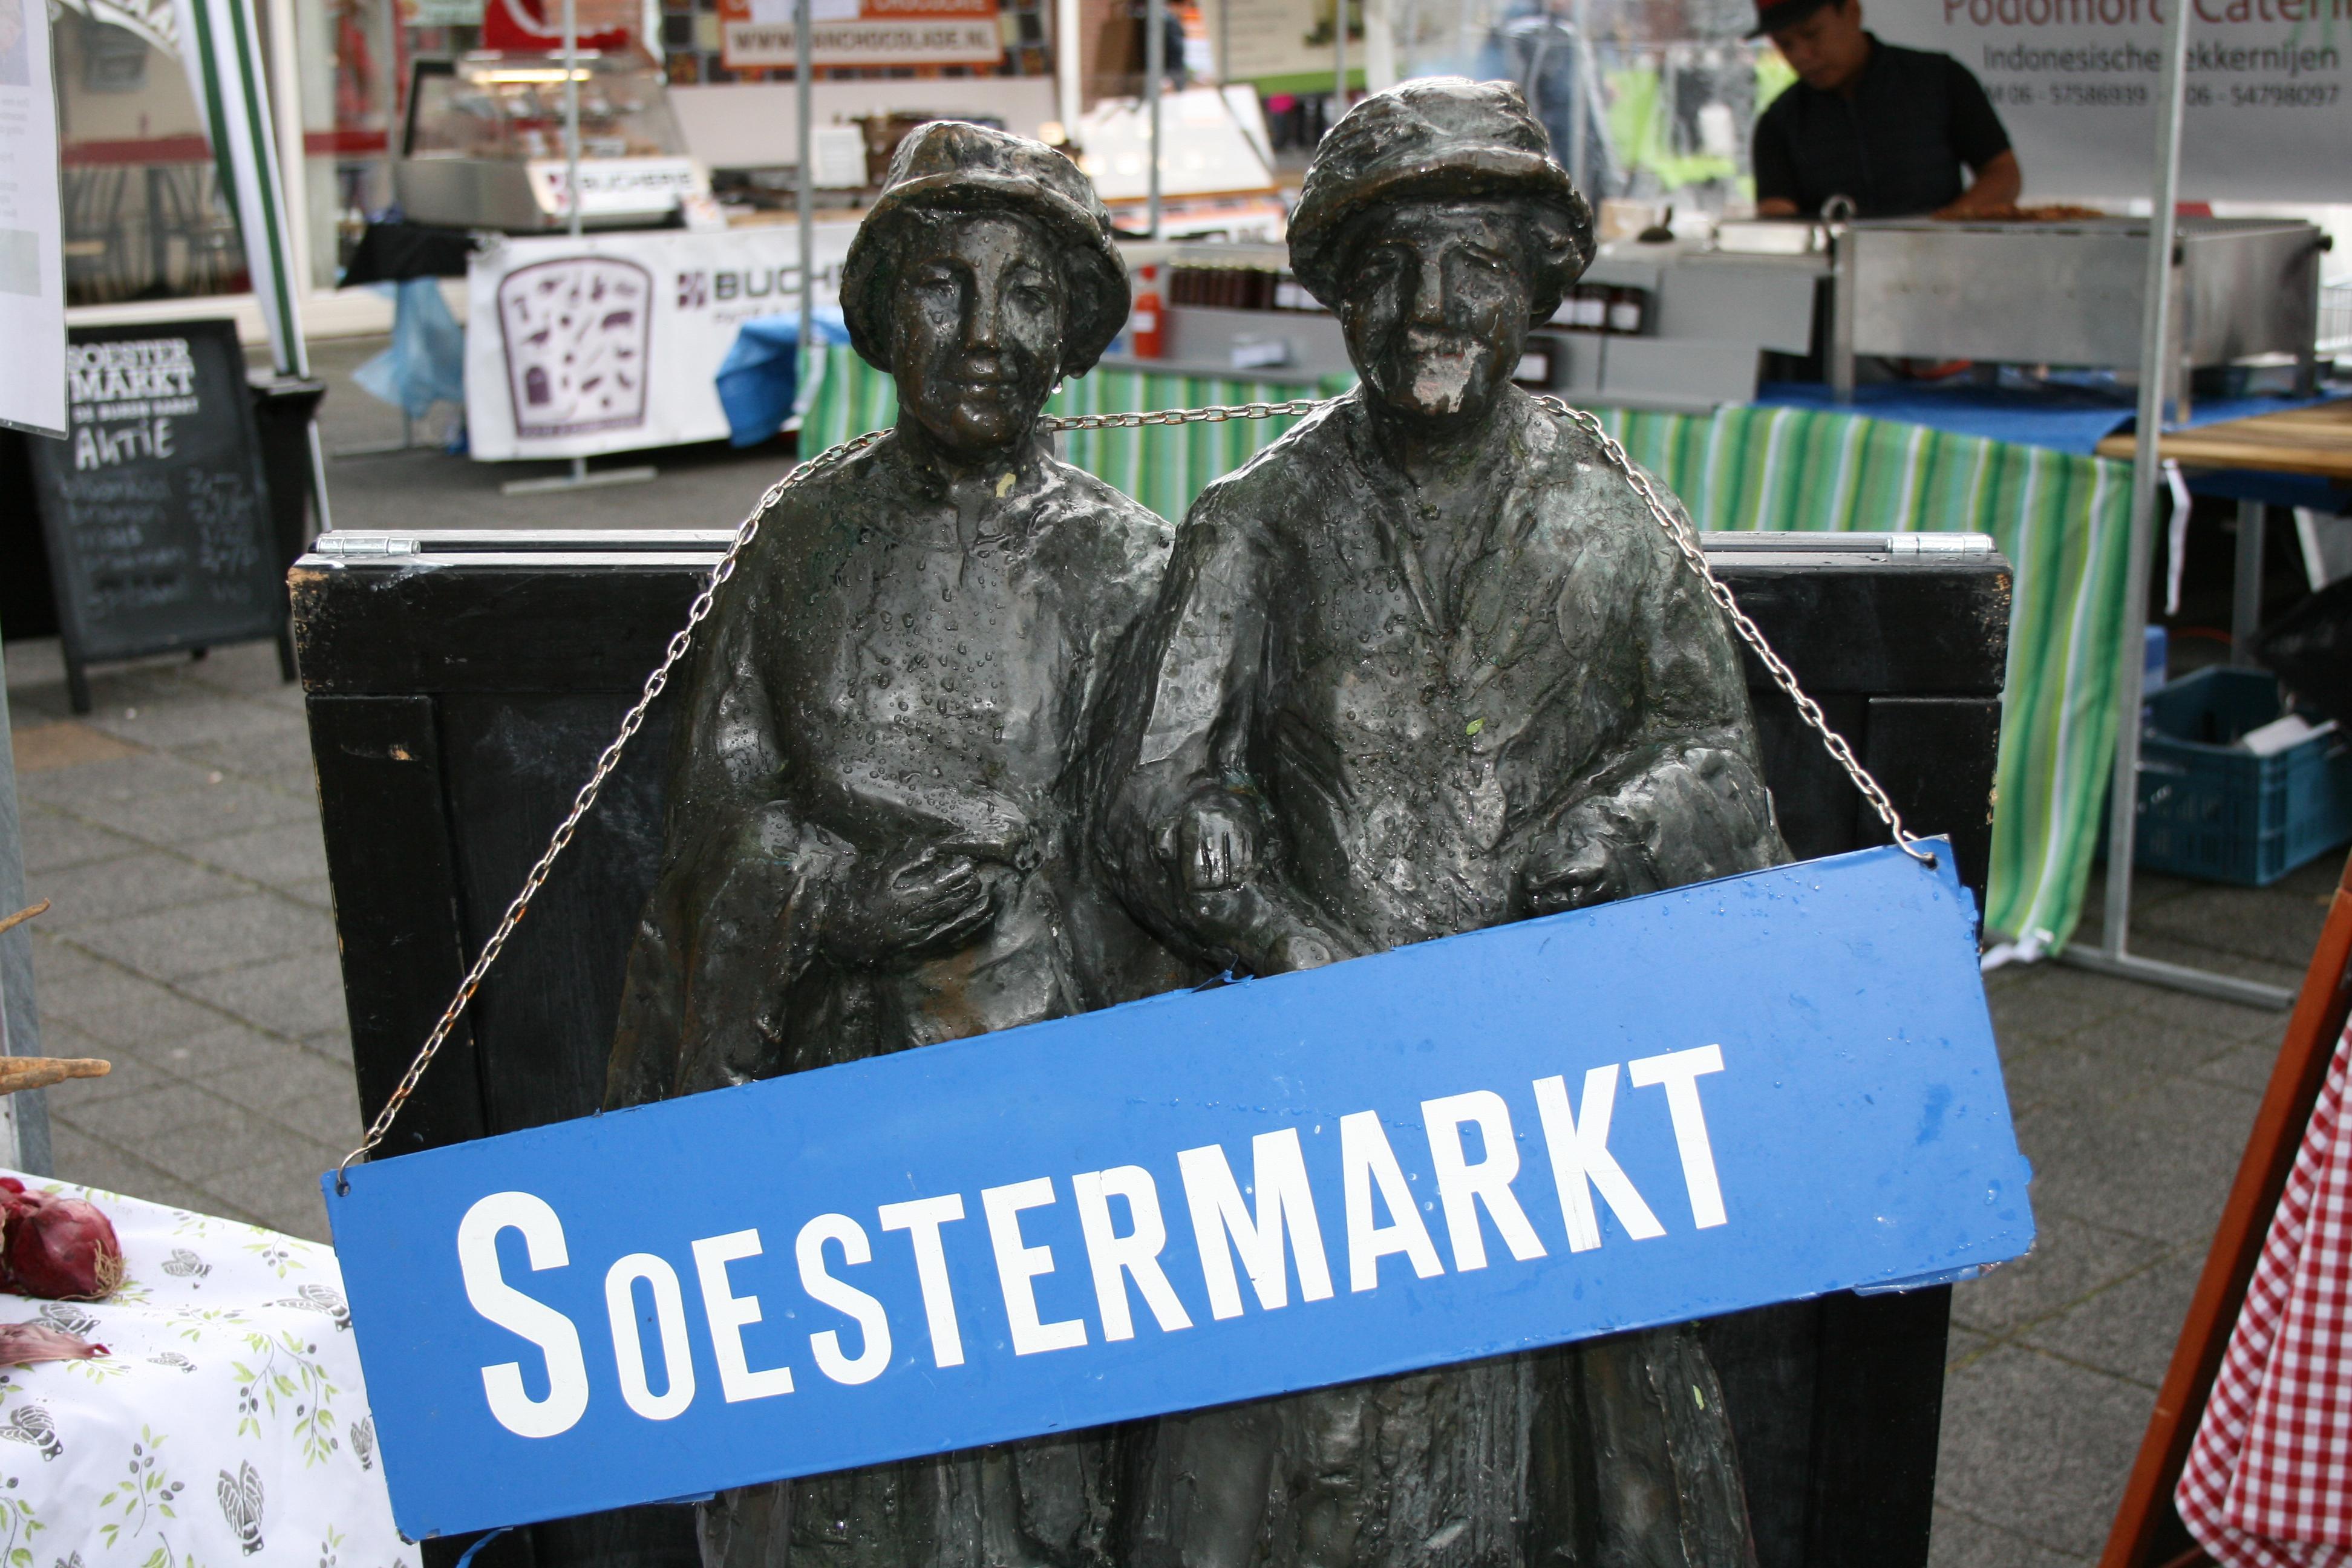 Soestermarkt